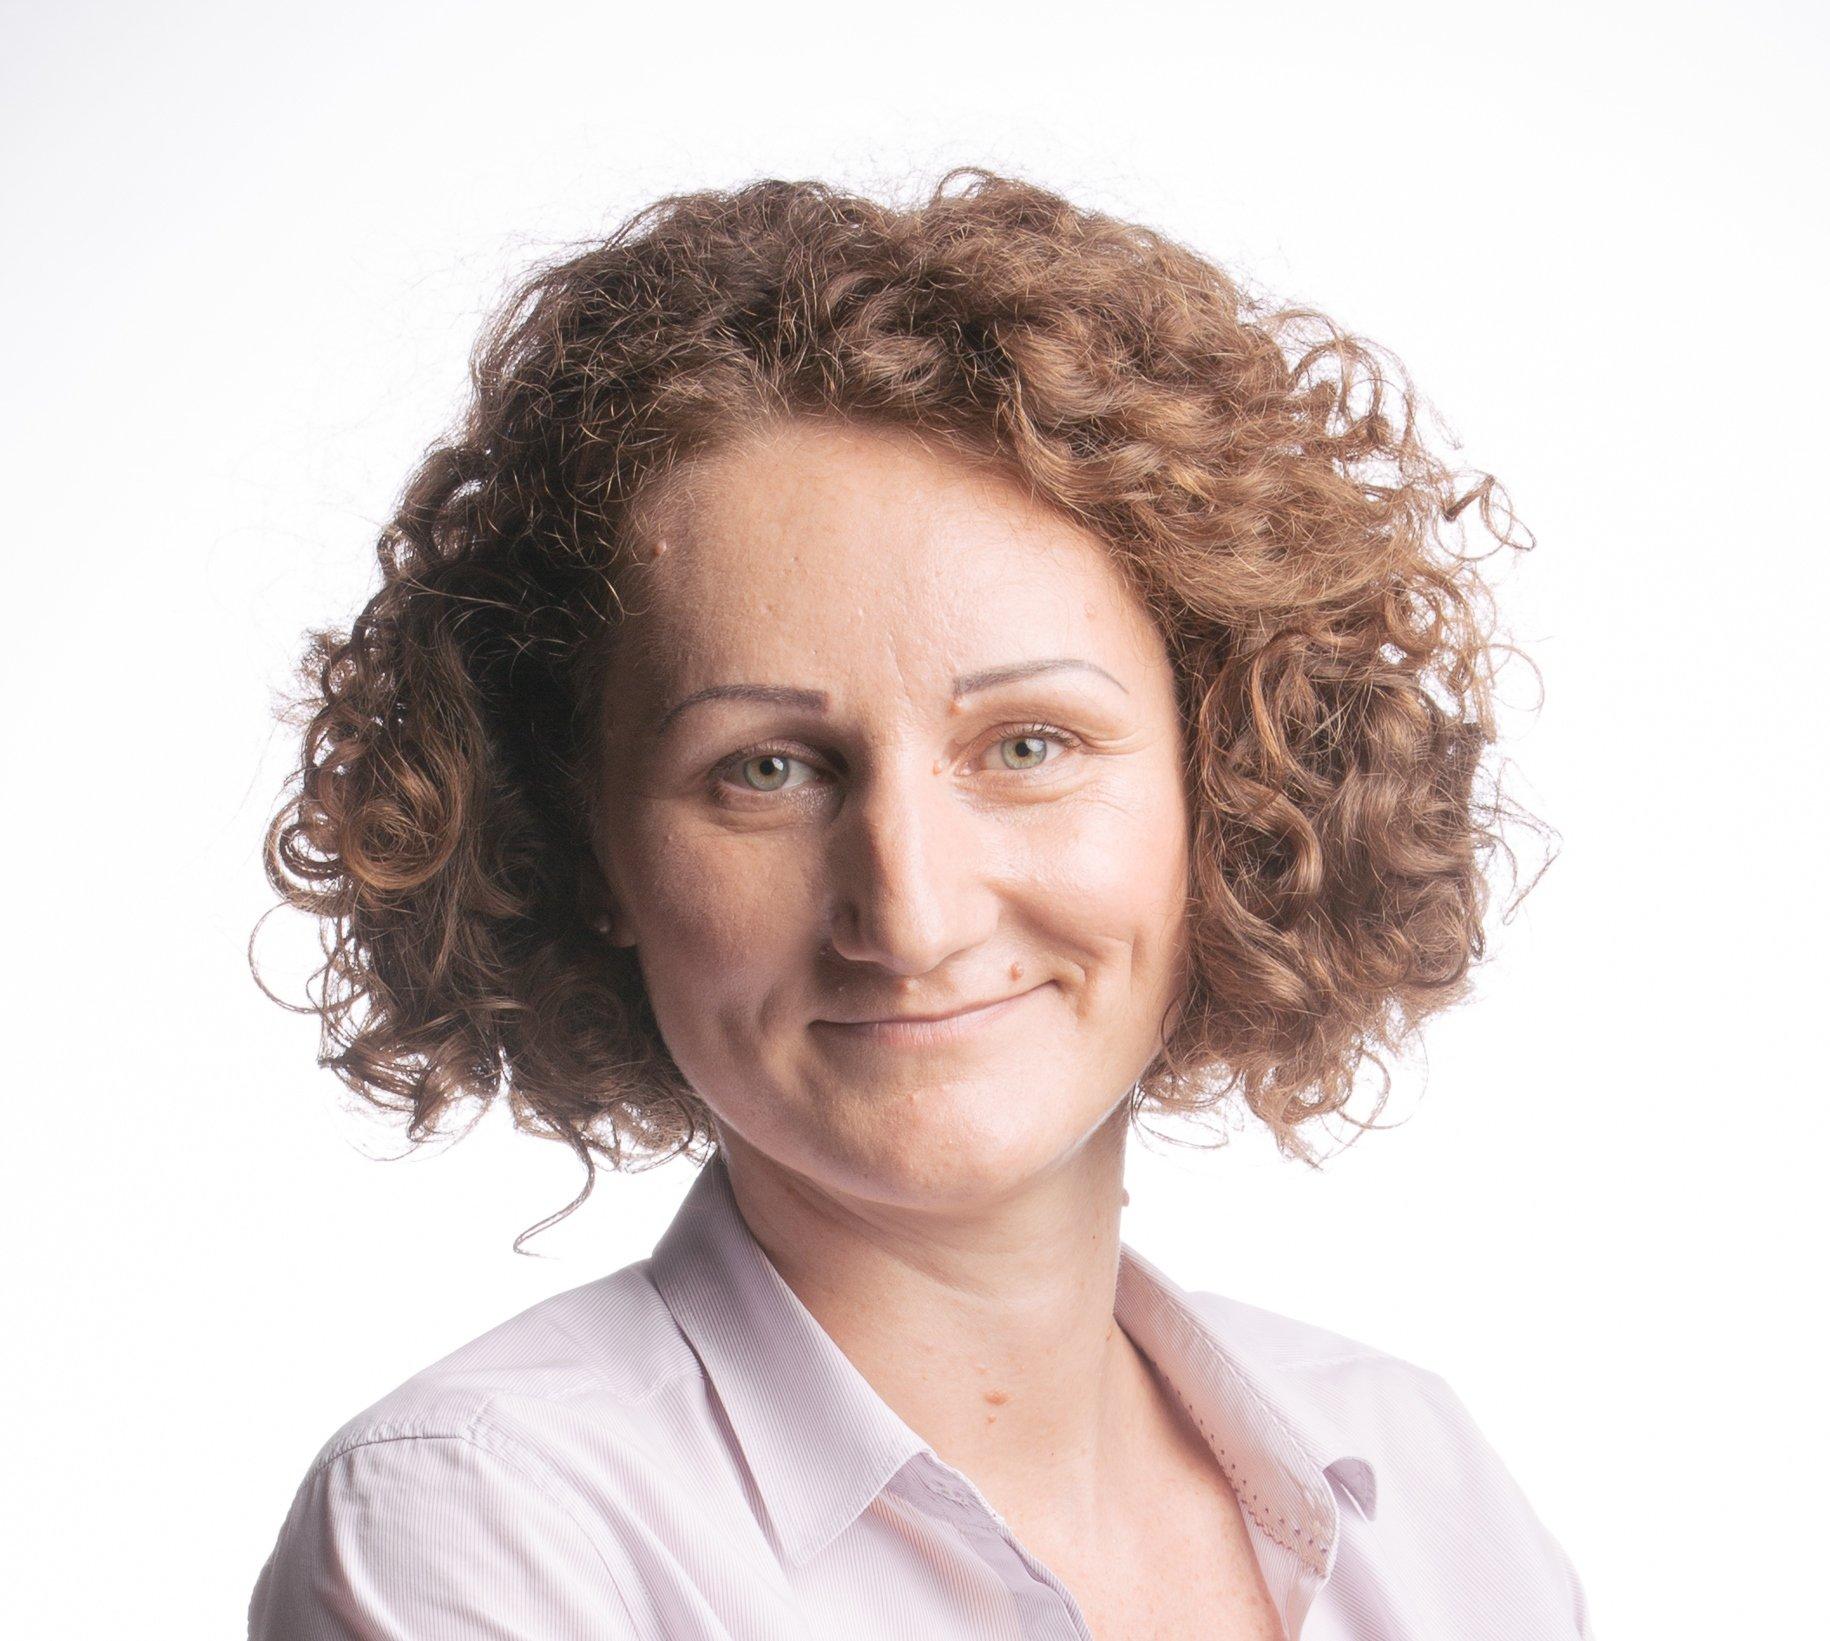 Geanina Ghiculescu, Head of Retail Marketing, METRO România